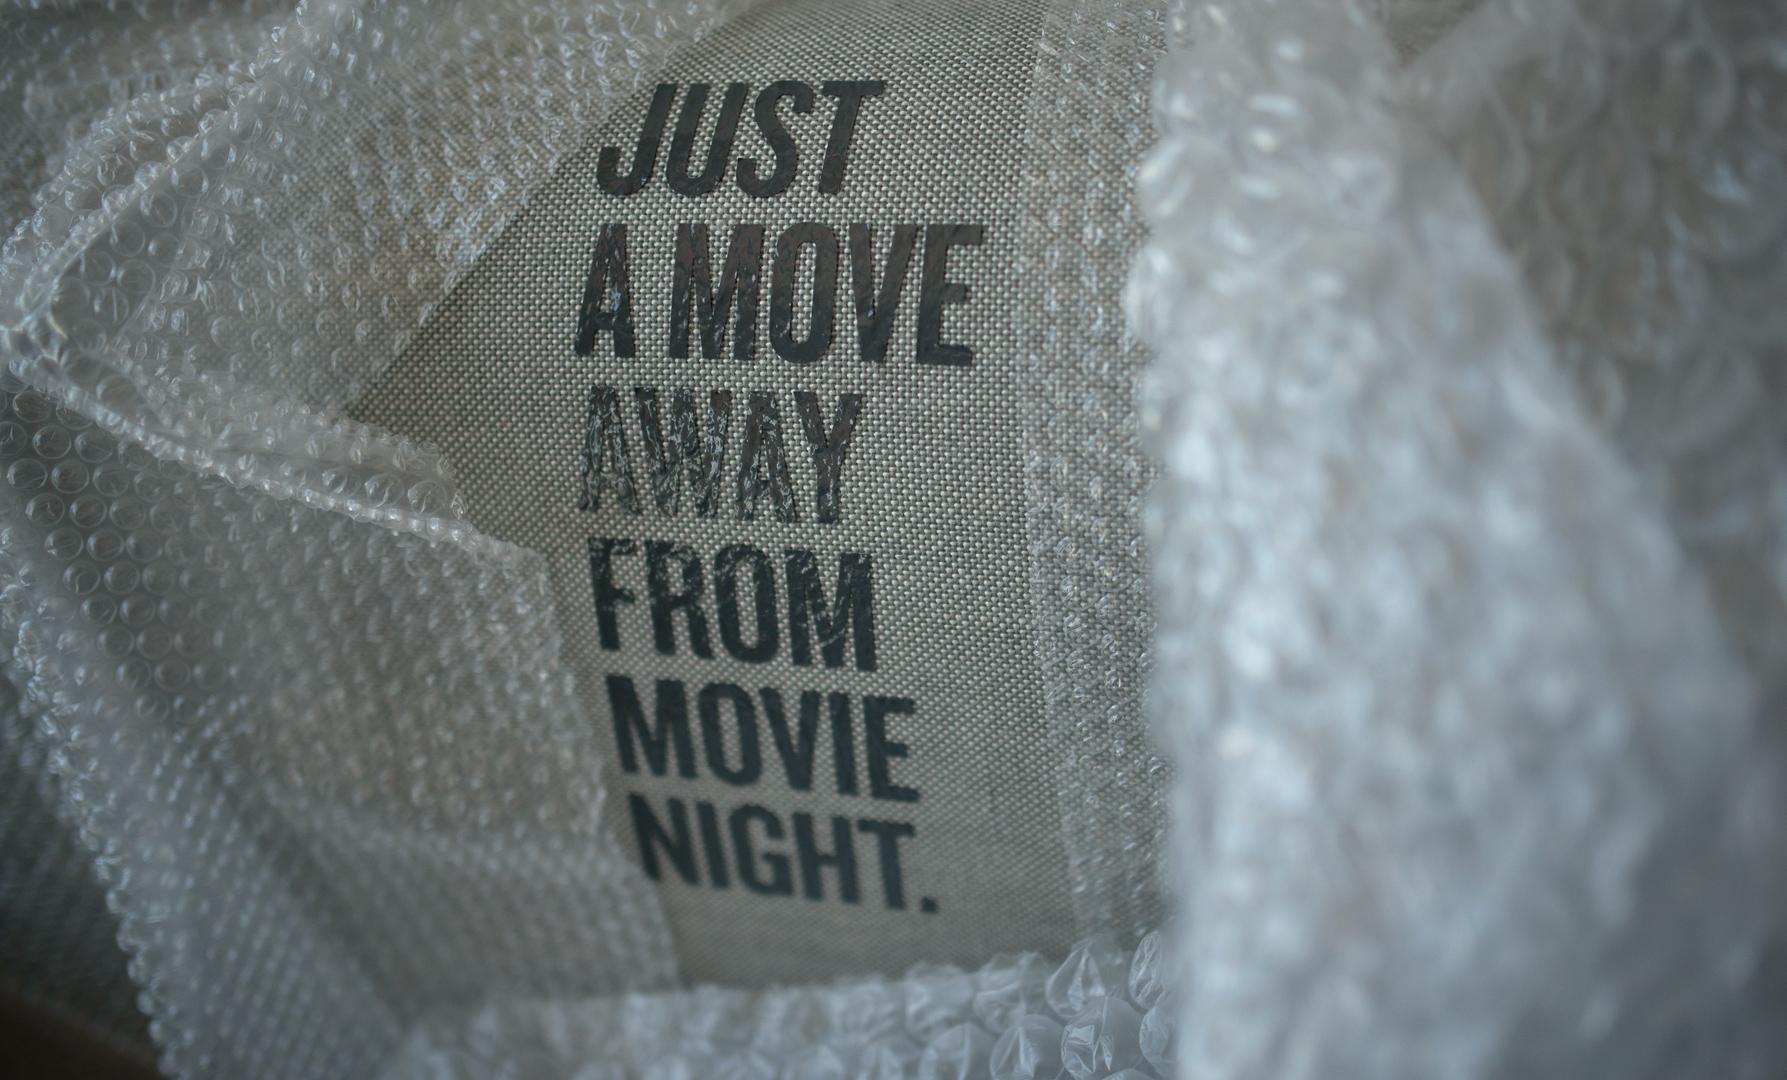 7.6_AOM_MovieNightSofa_Trestle.jpg